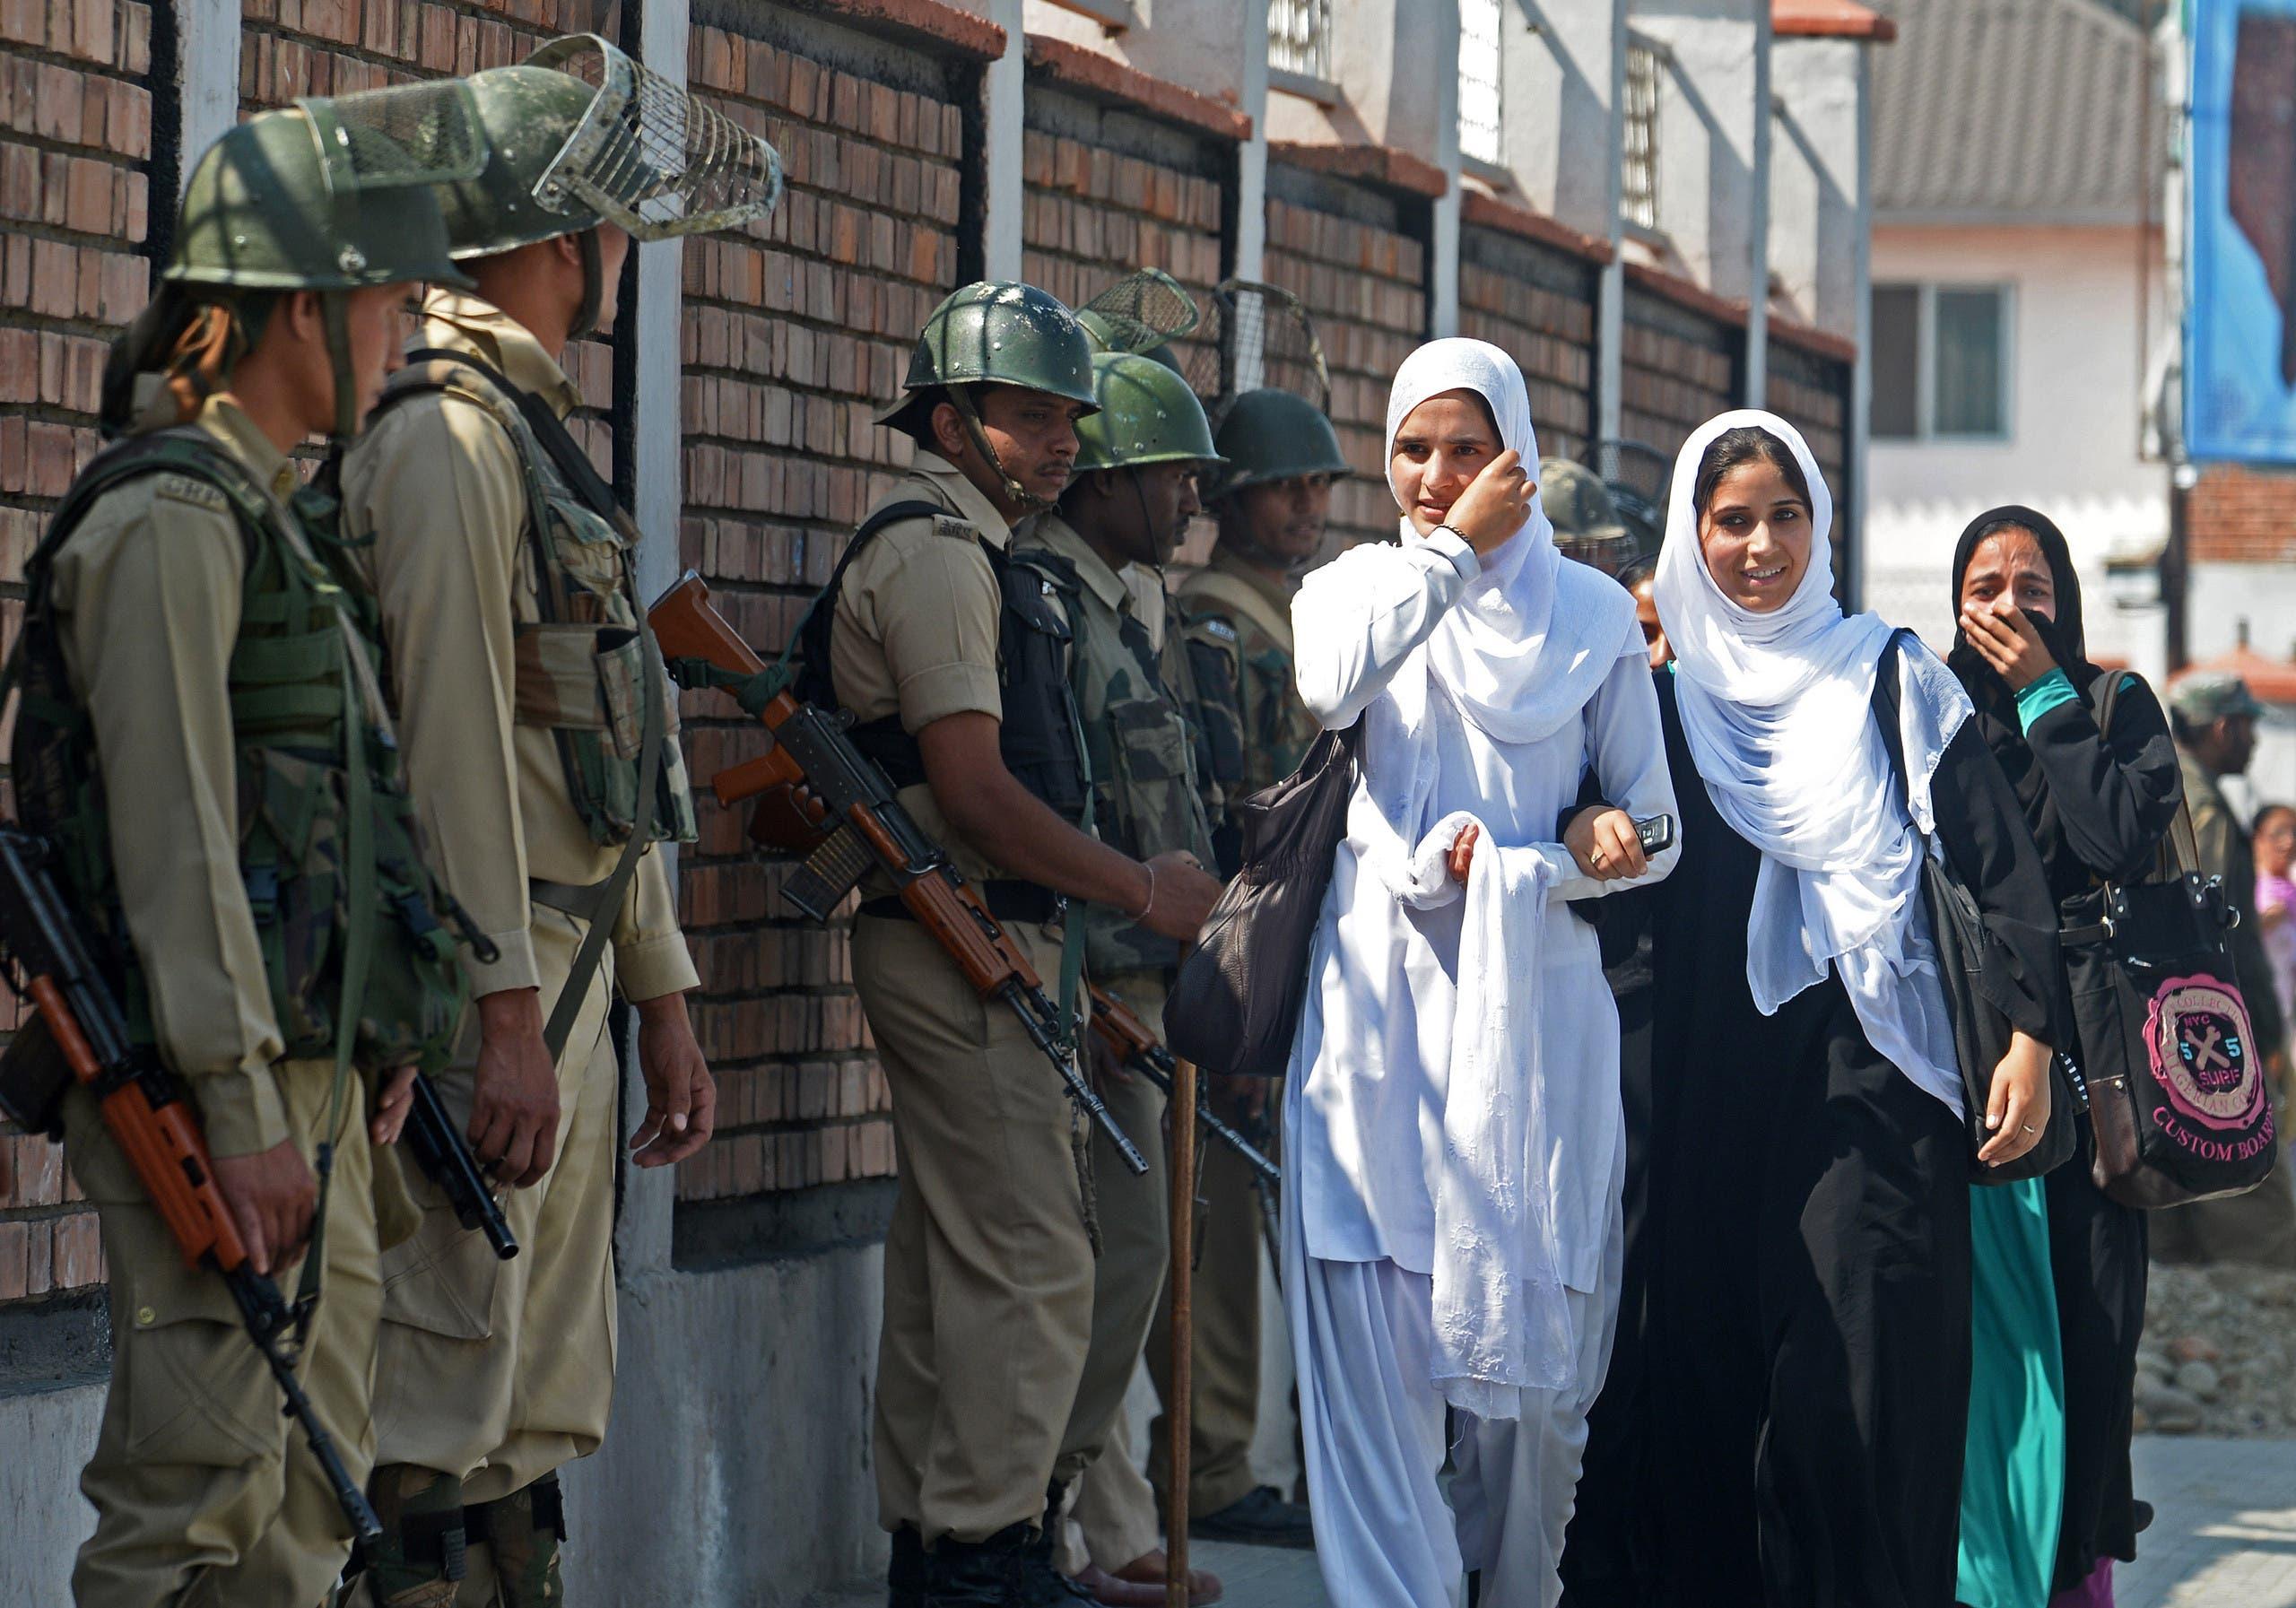 Indian paramilitary troopers stand guard as Kashmiri Muslim school girls walk past in Srinagar on October 1, 2013. (AFP)